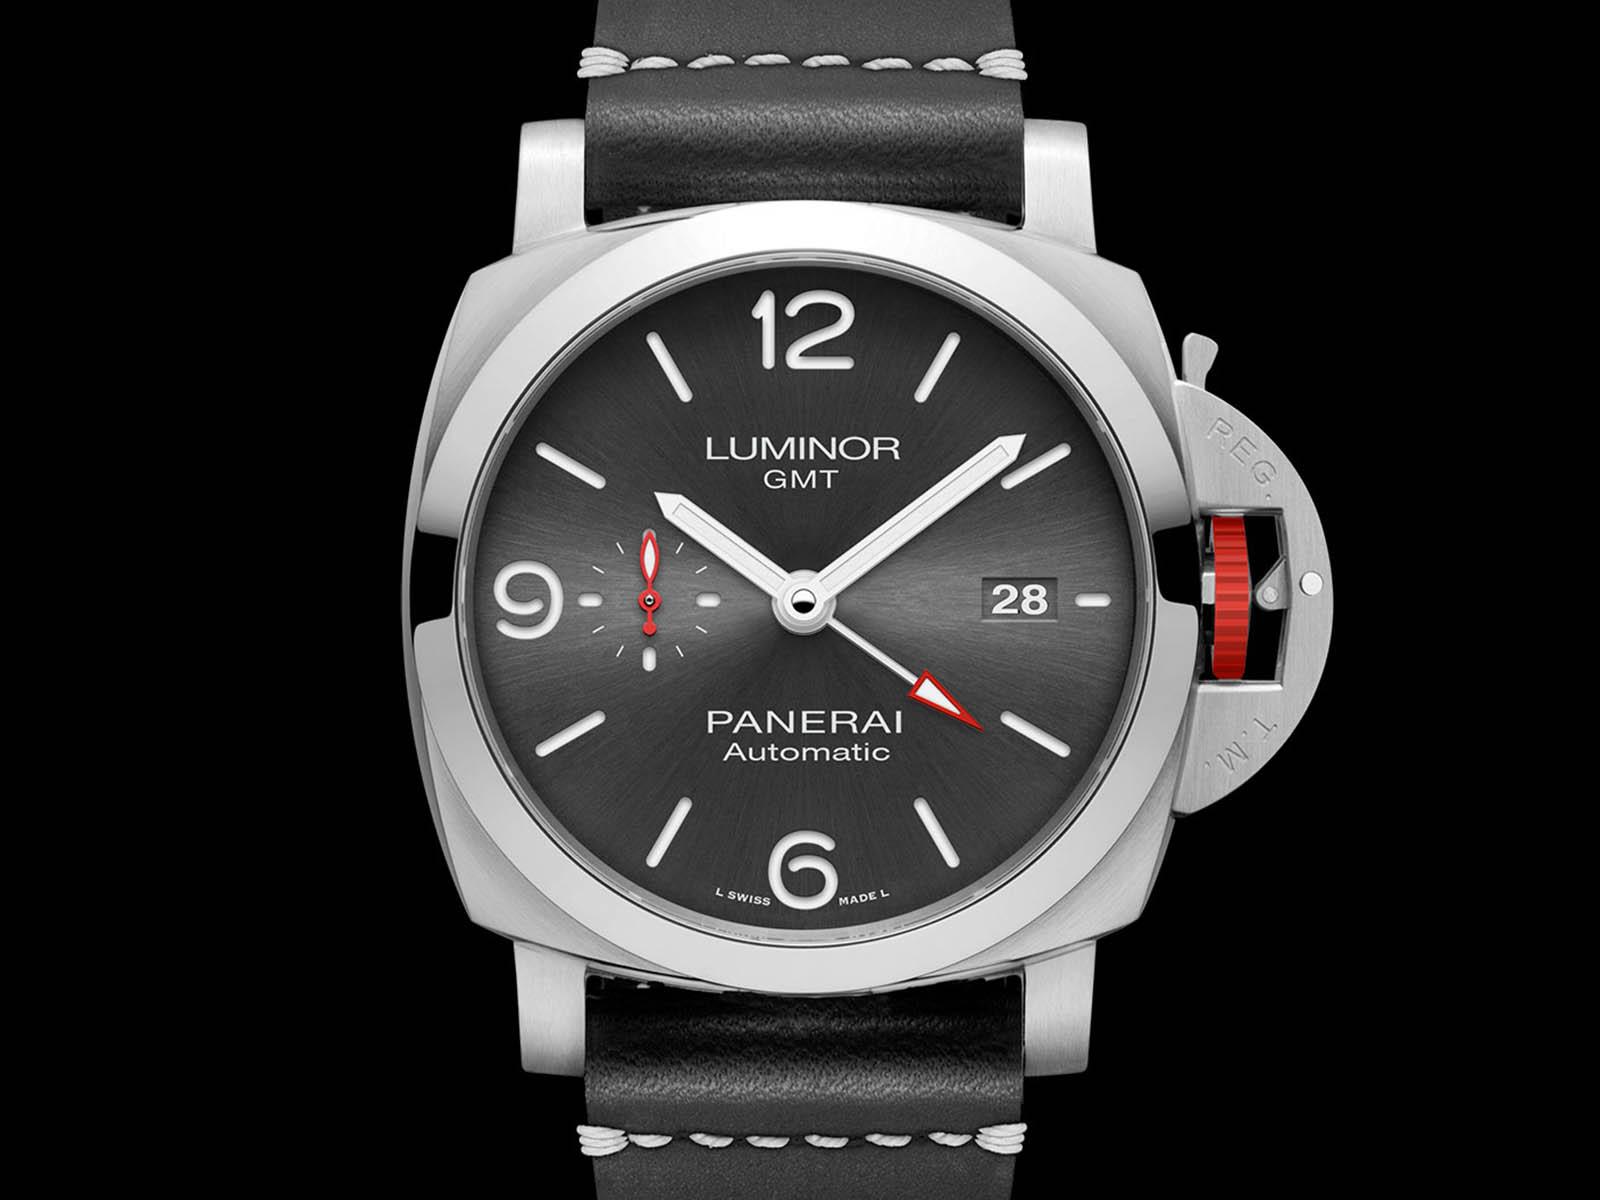 pam01177-officine-panerai-luminor-gmt-ion-singapore-edition-2.jpg